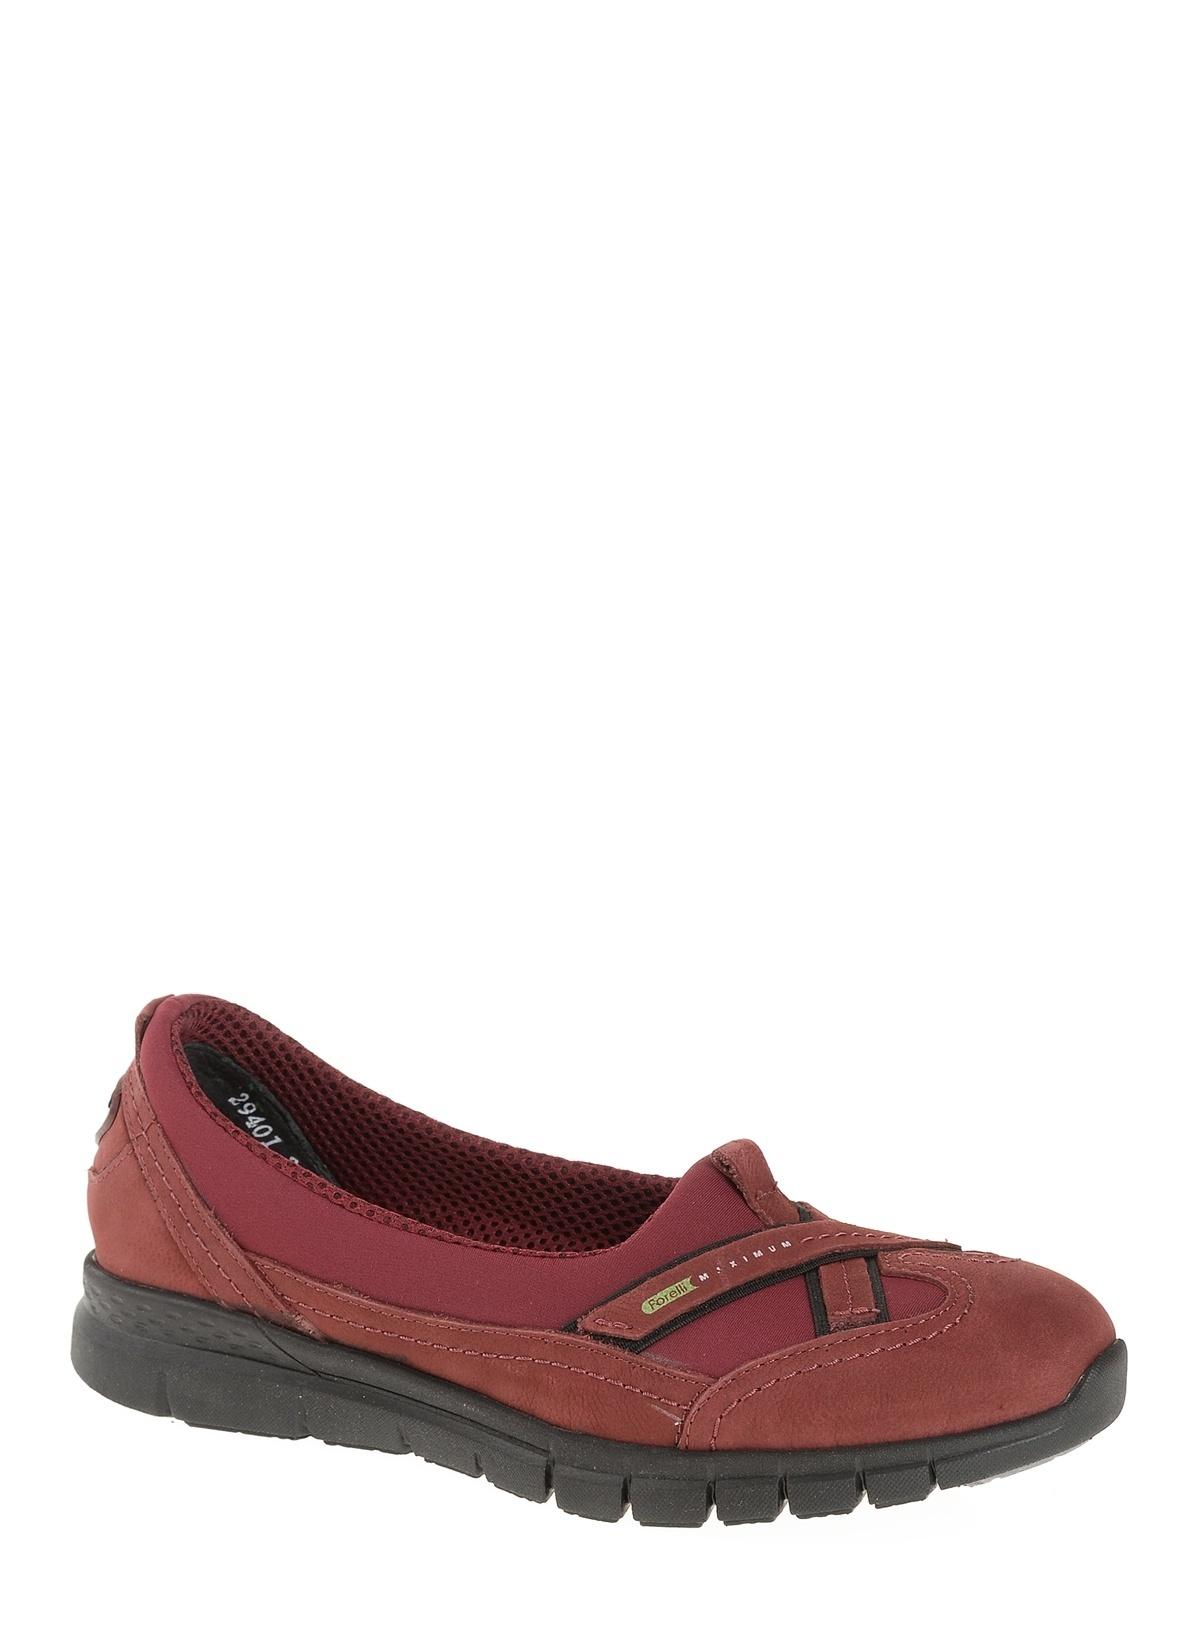 Forelli %100 Deri Babet Mfrb294010117g0-ayakkabı – 189.9 TL